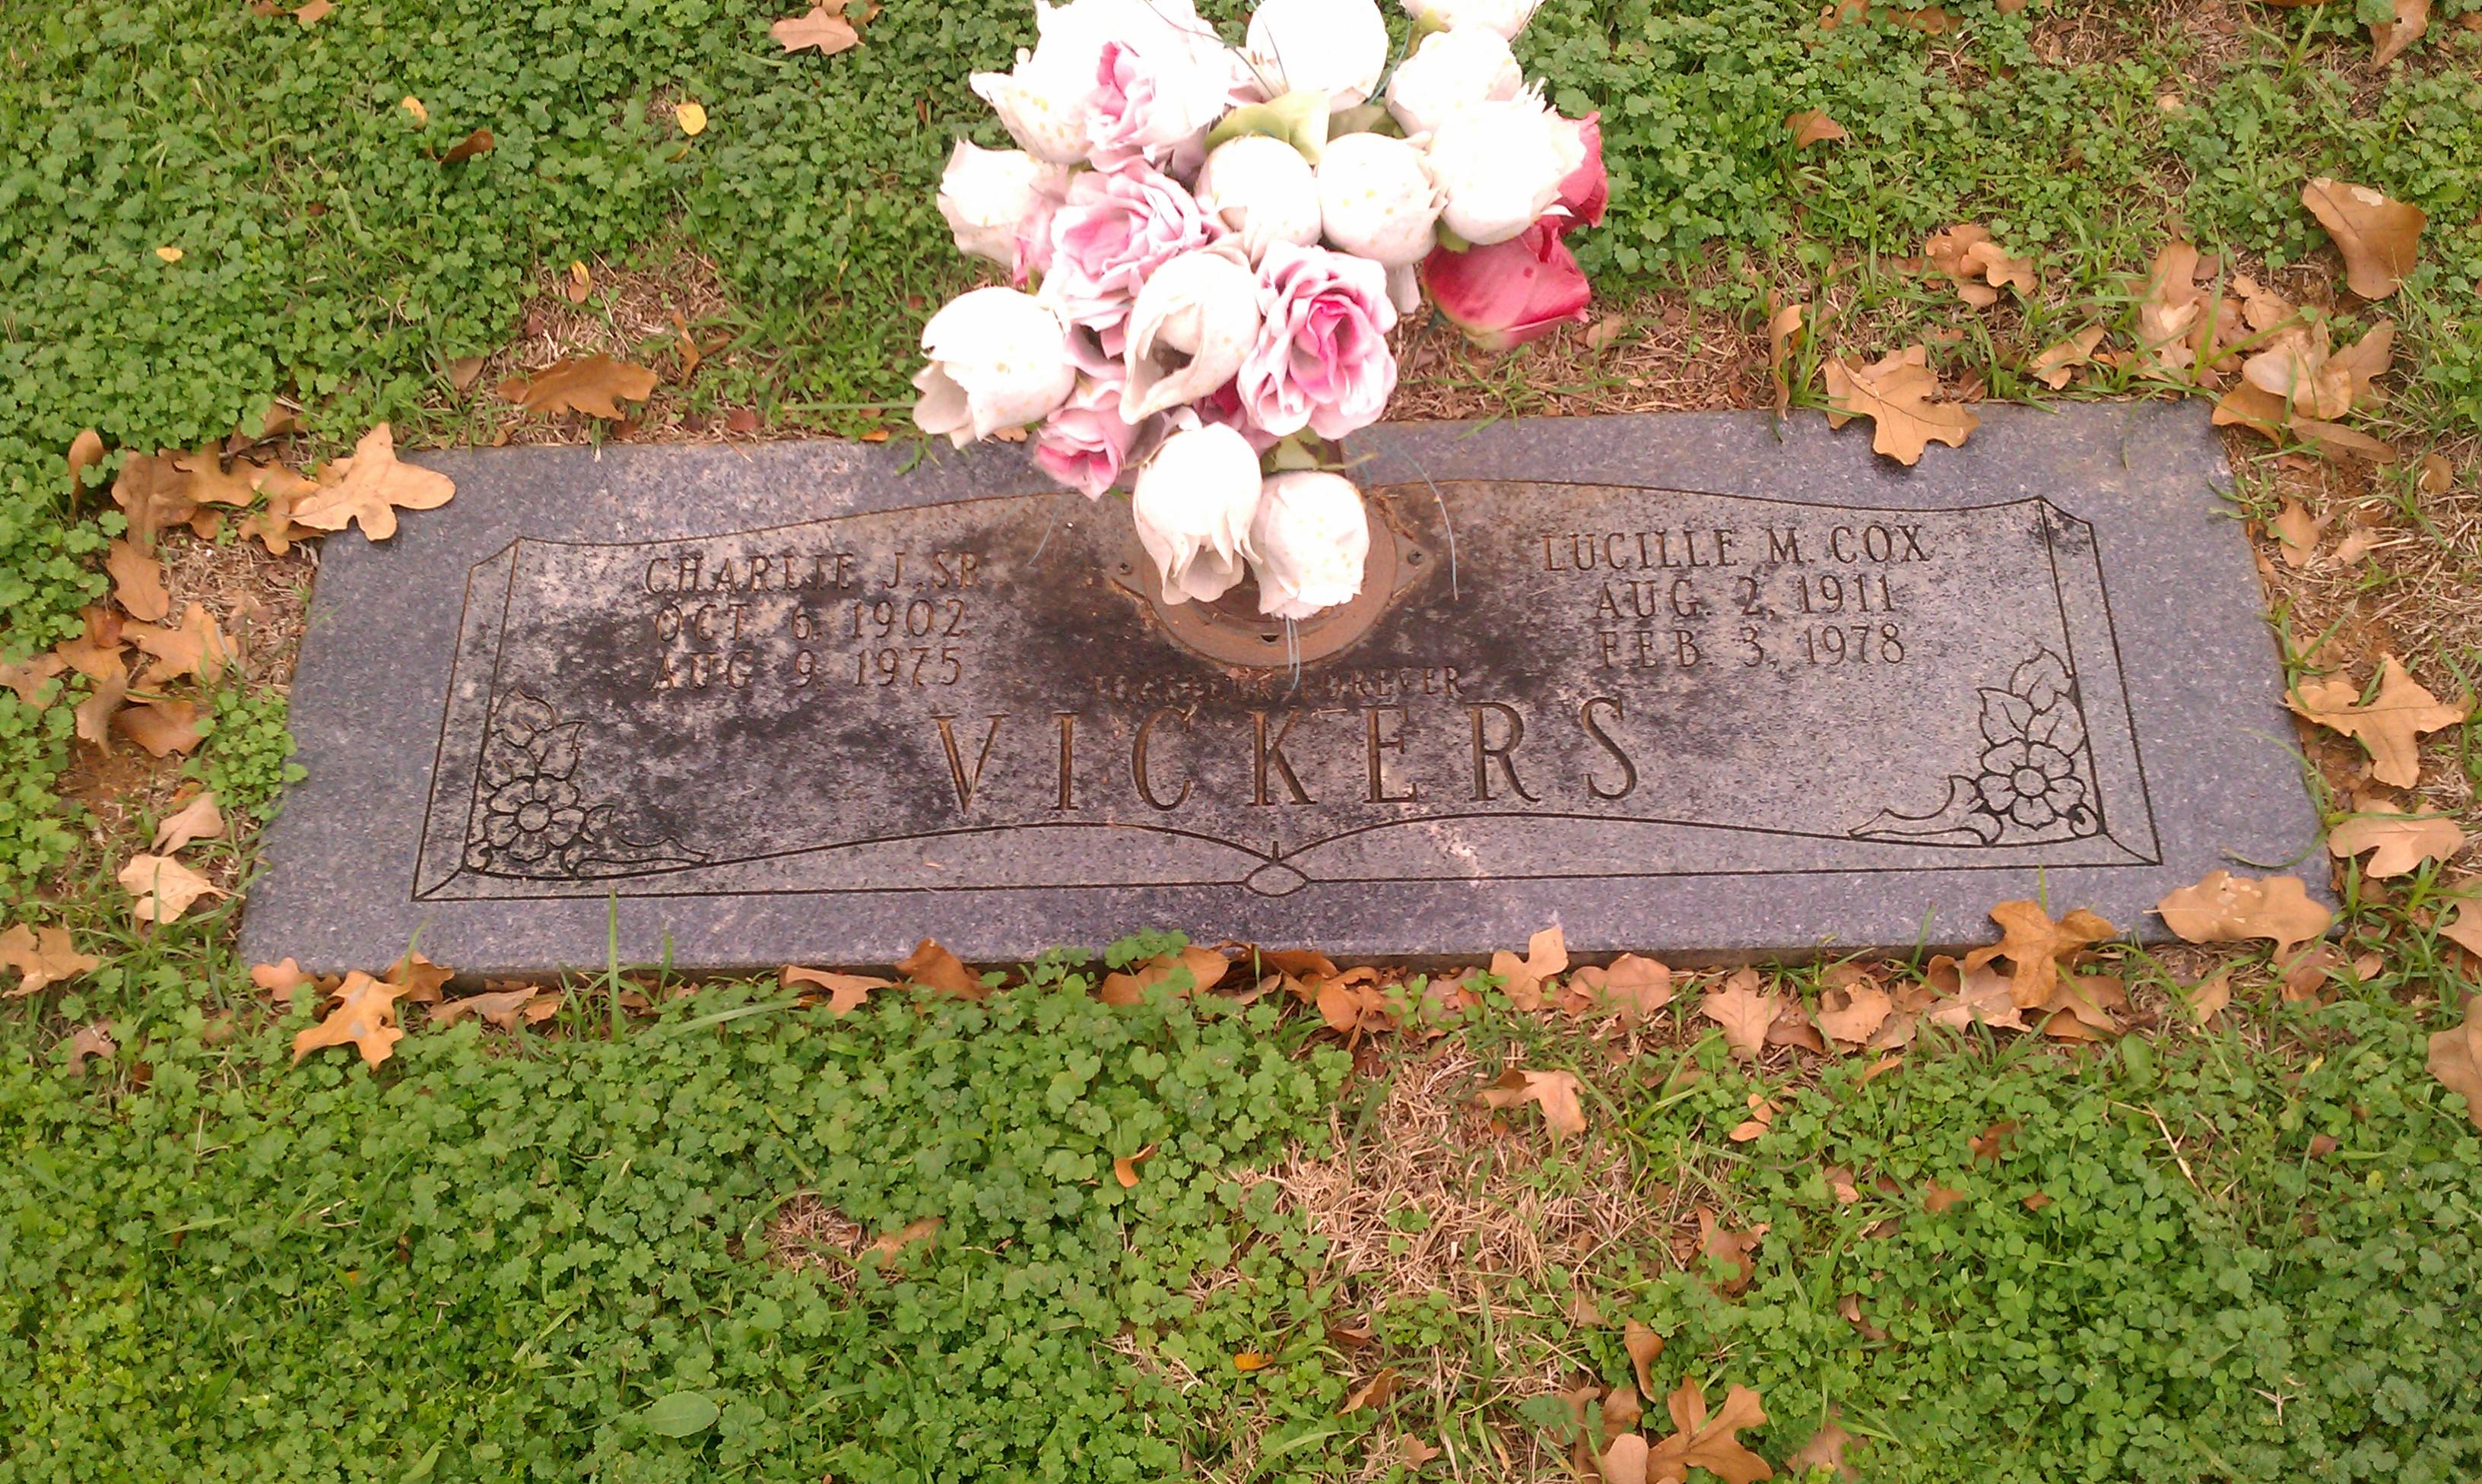 Lucille M. Cox gravestone